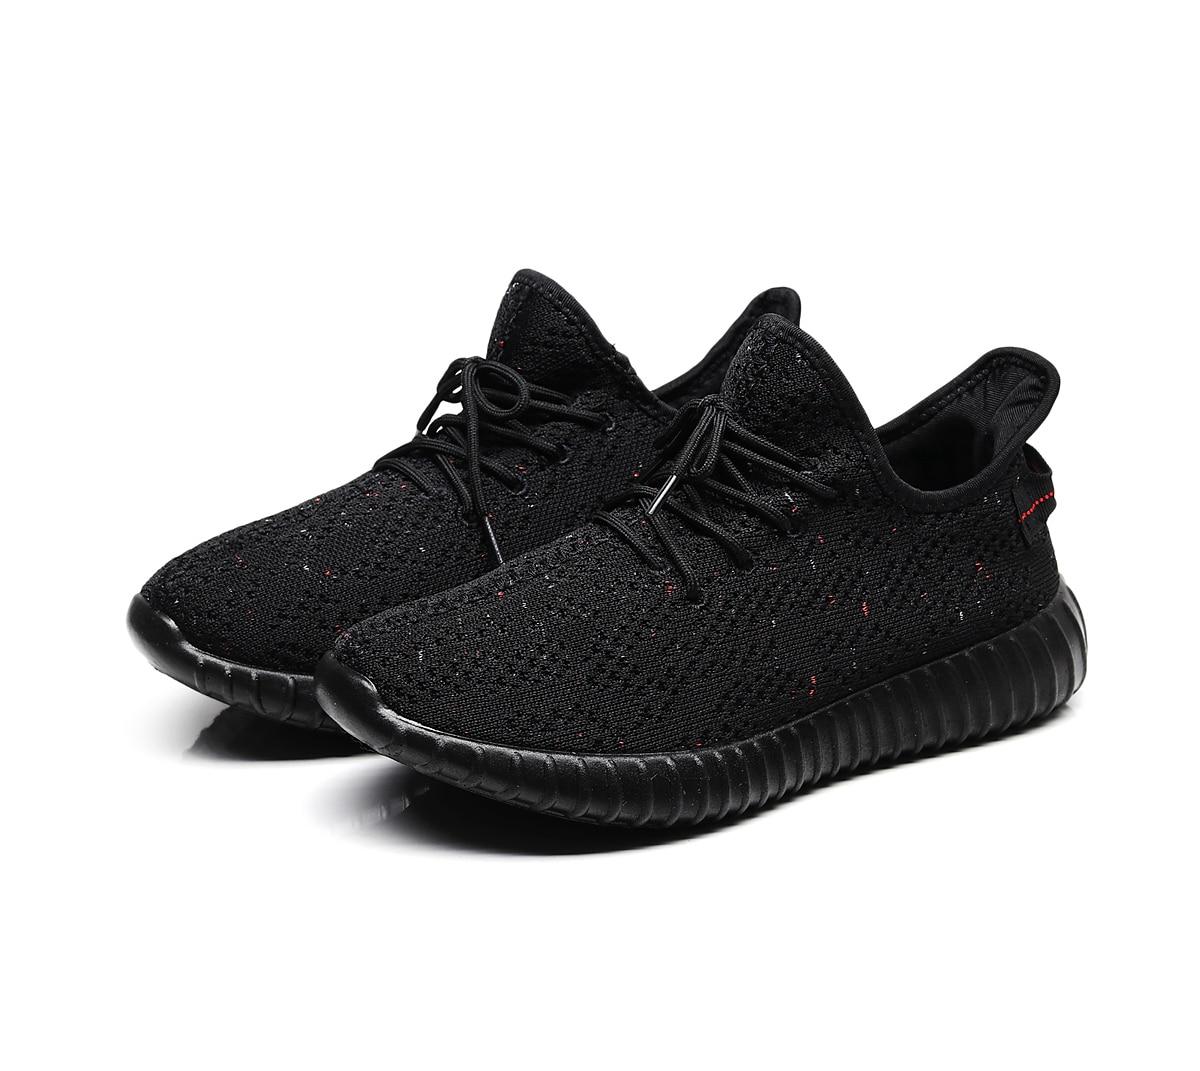 Hommes Unisexe New Chaussures Sneakers Vente Couples Espadrilles m0nN8vwO